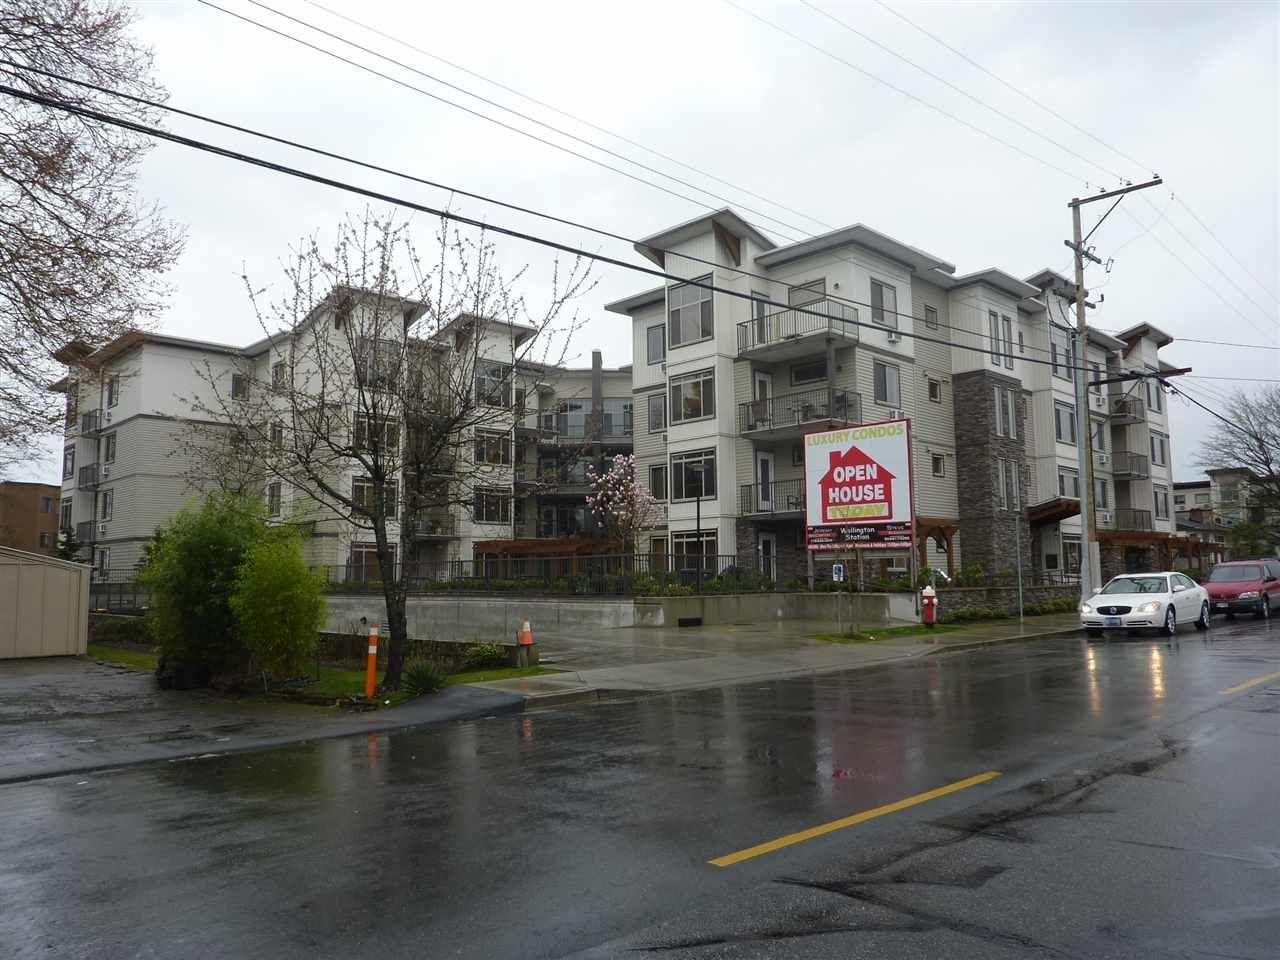 Main Photo: 215 11887 BURNETT Street in Maple Ridge: East Central Condo for sale : MLS®# R2114347